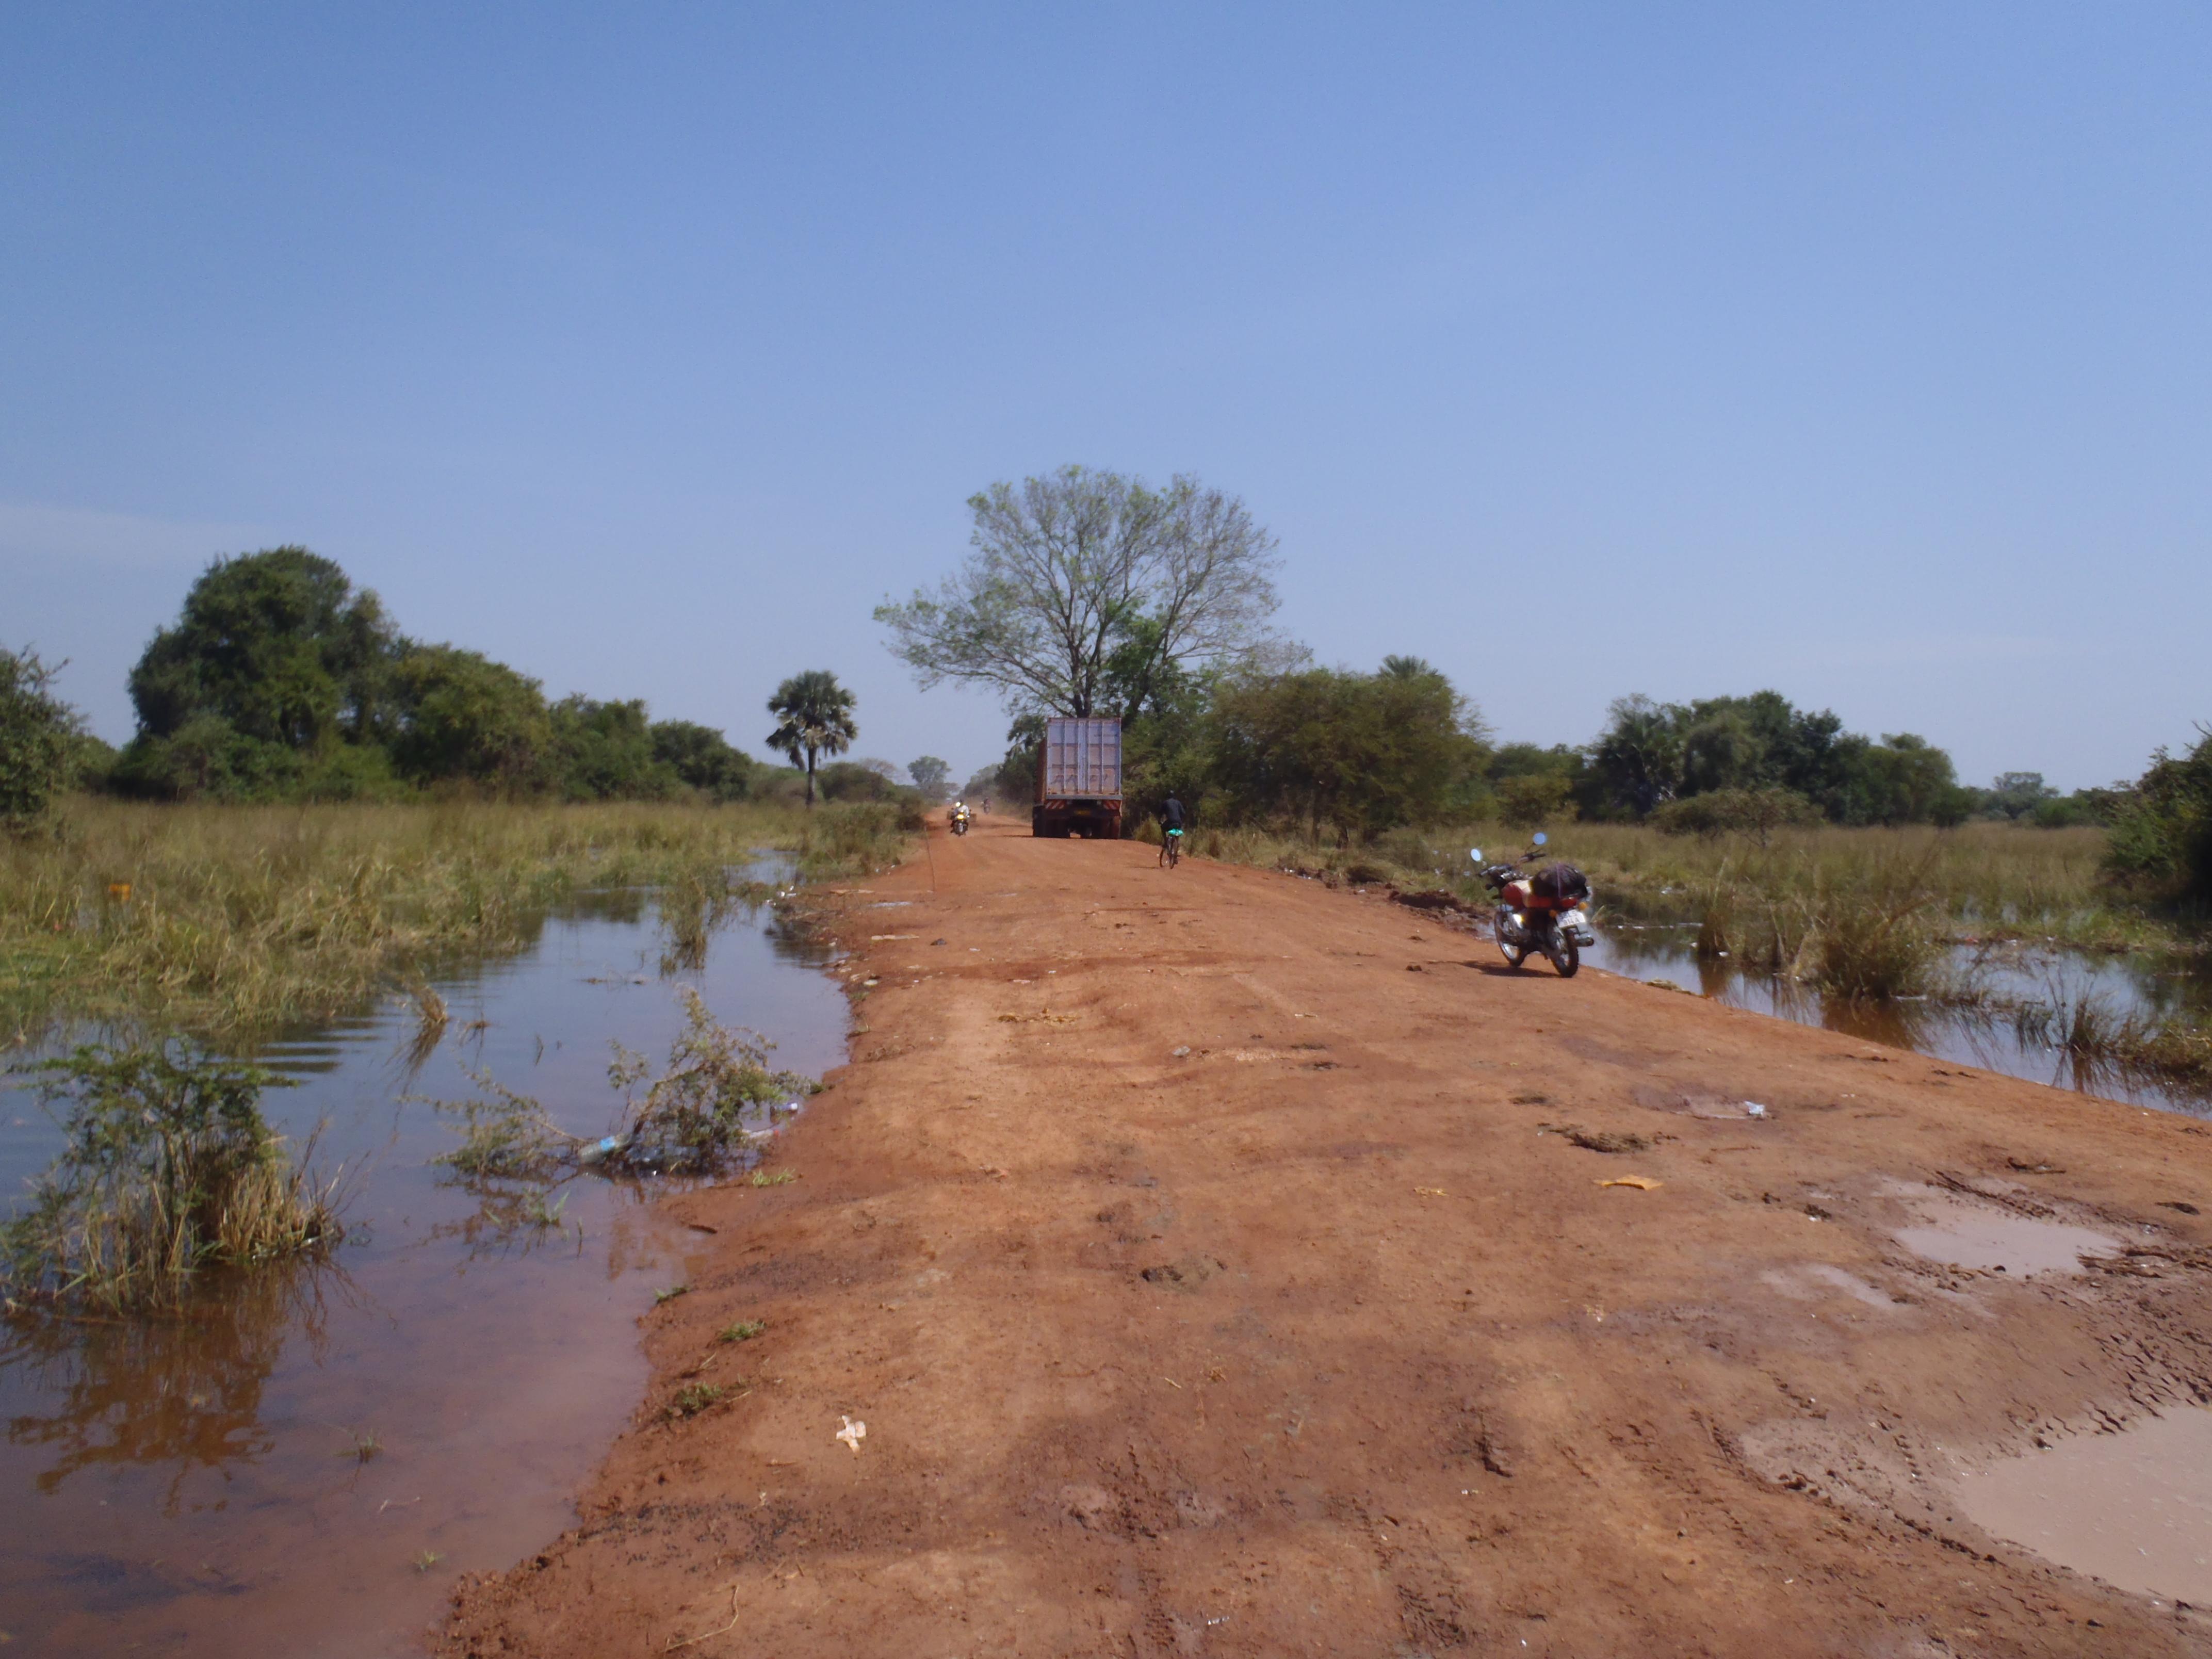 filethe yirol road just outside yirol town south sudan